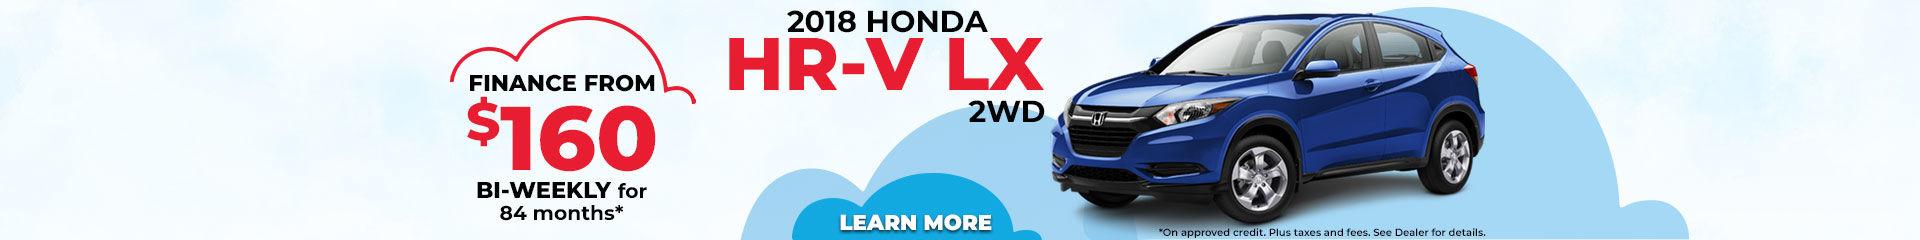 Finance the 2018 Honda HR-V LX